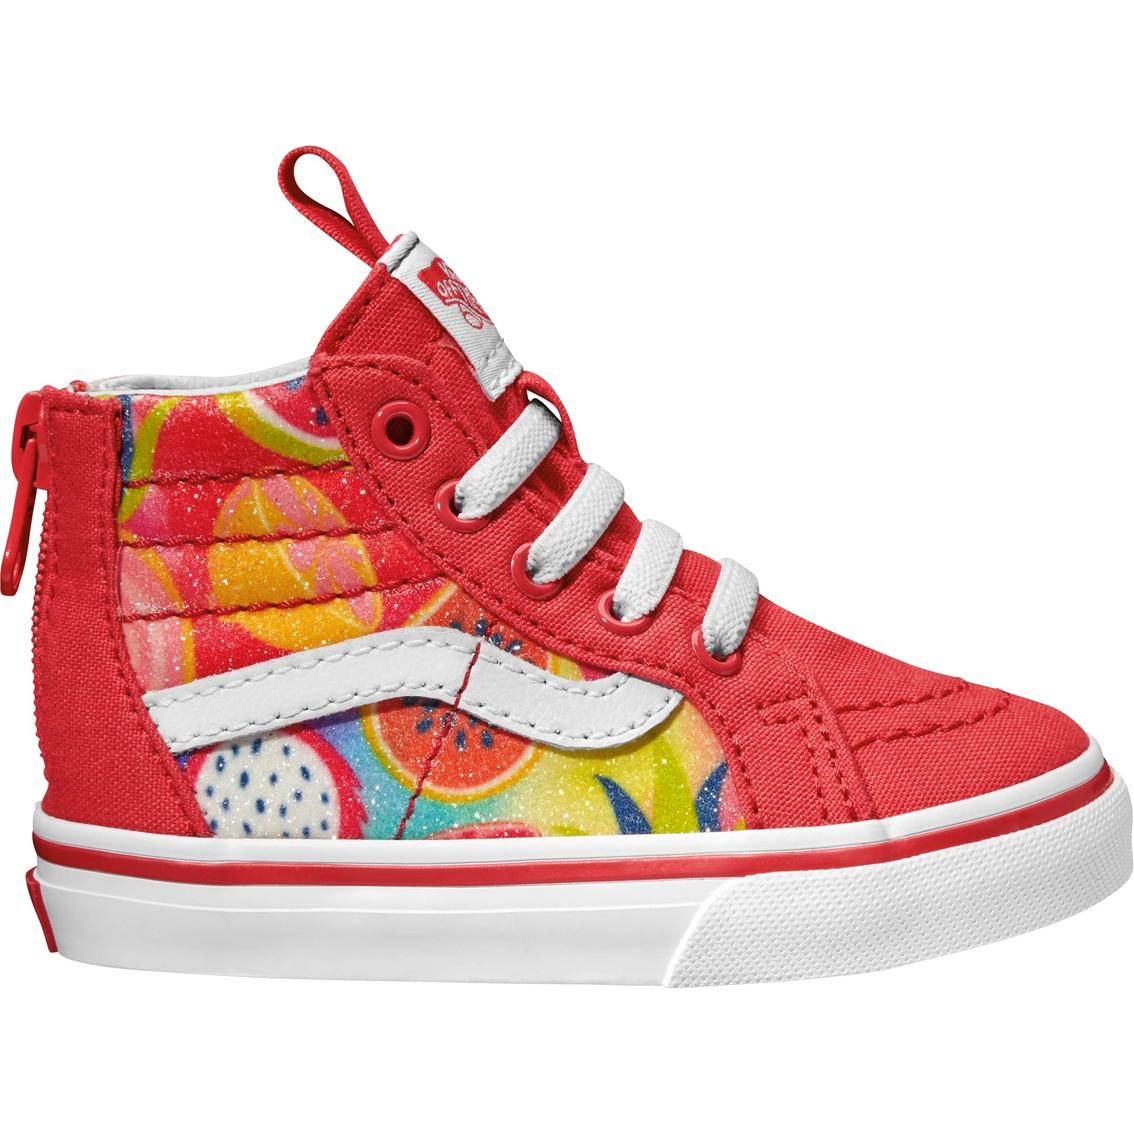 b72b5ddea1ac1e Vans Little Girls Sk8 Hi Zip Fruit Sneakers